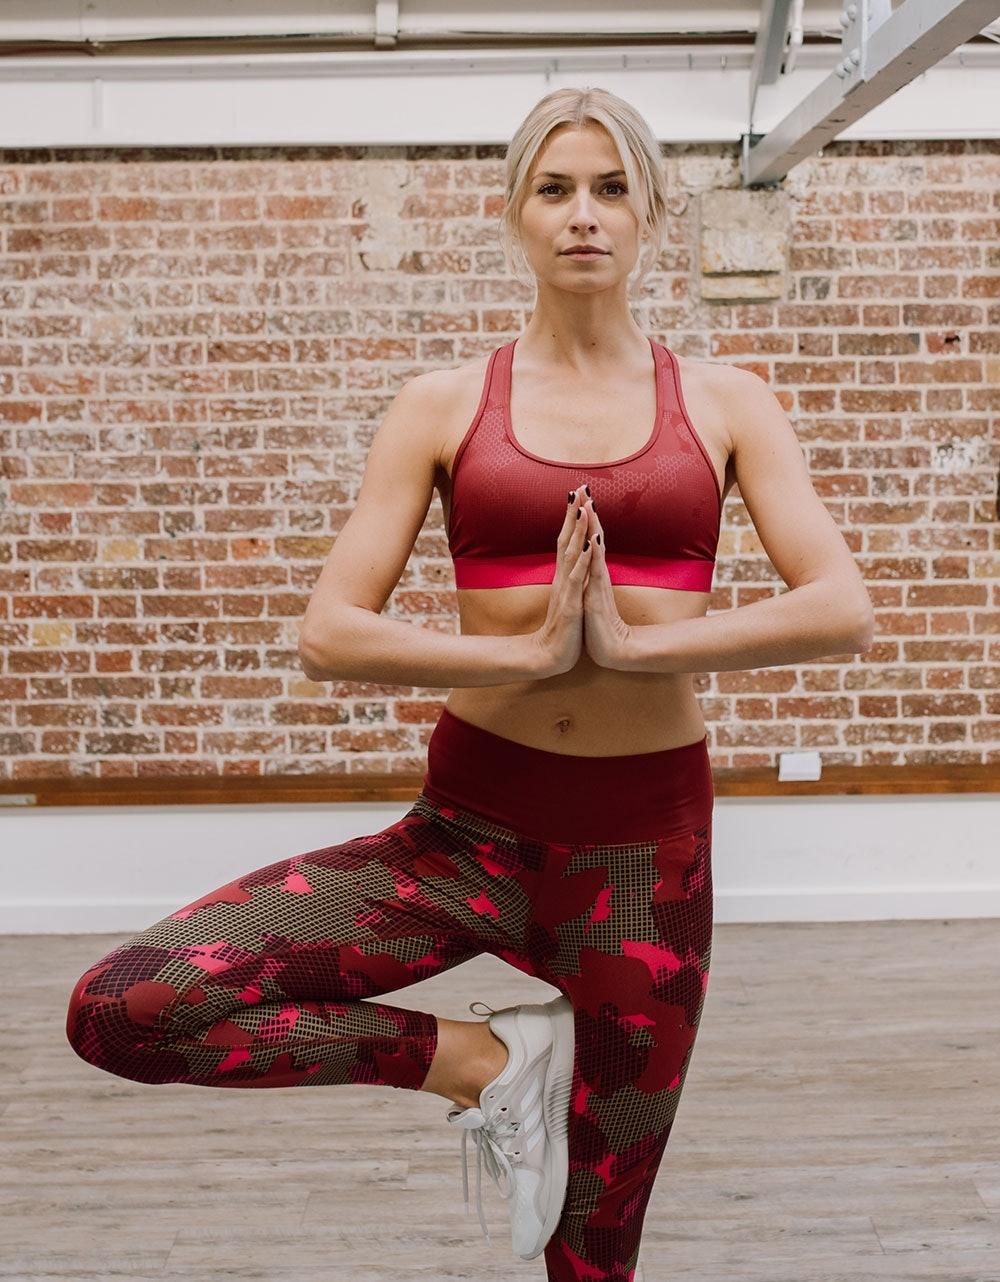 Lena Gercke liebt Yoga